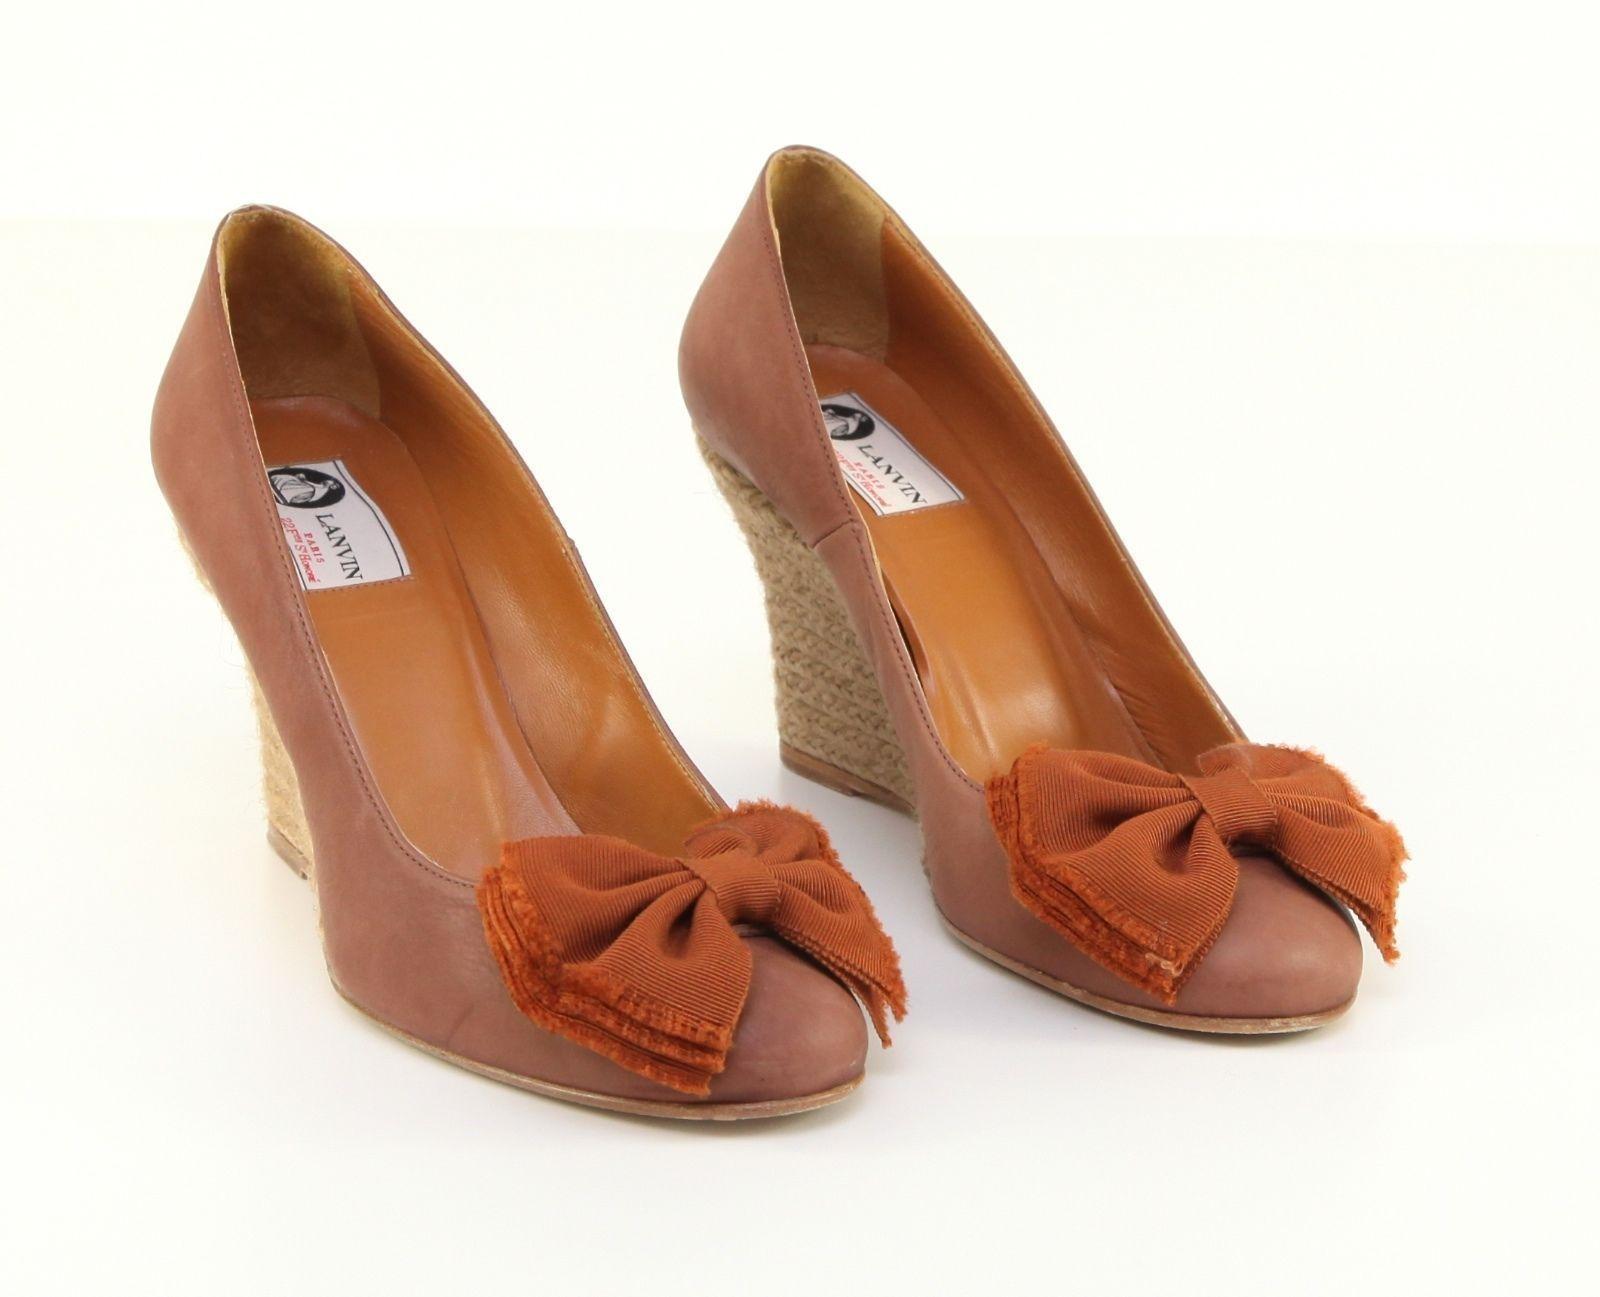 LANVIN Brown Espadrille Wedge Pump Heel Nubuck Suede Leather Shoe 39